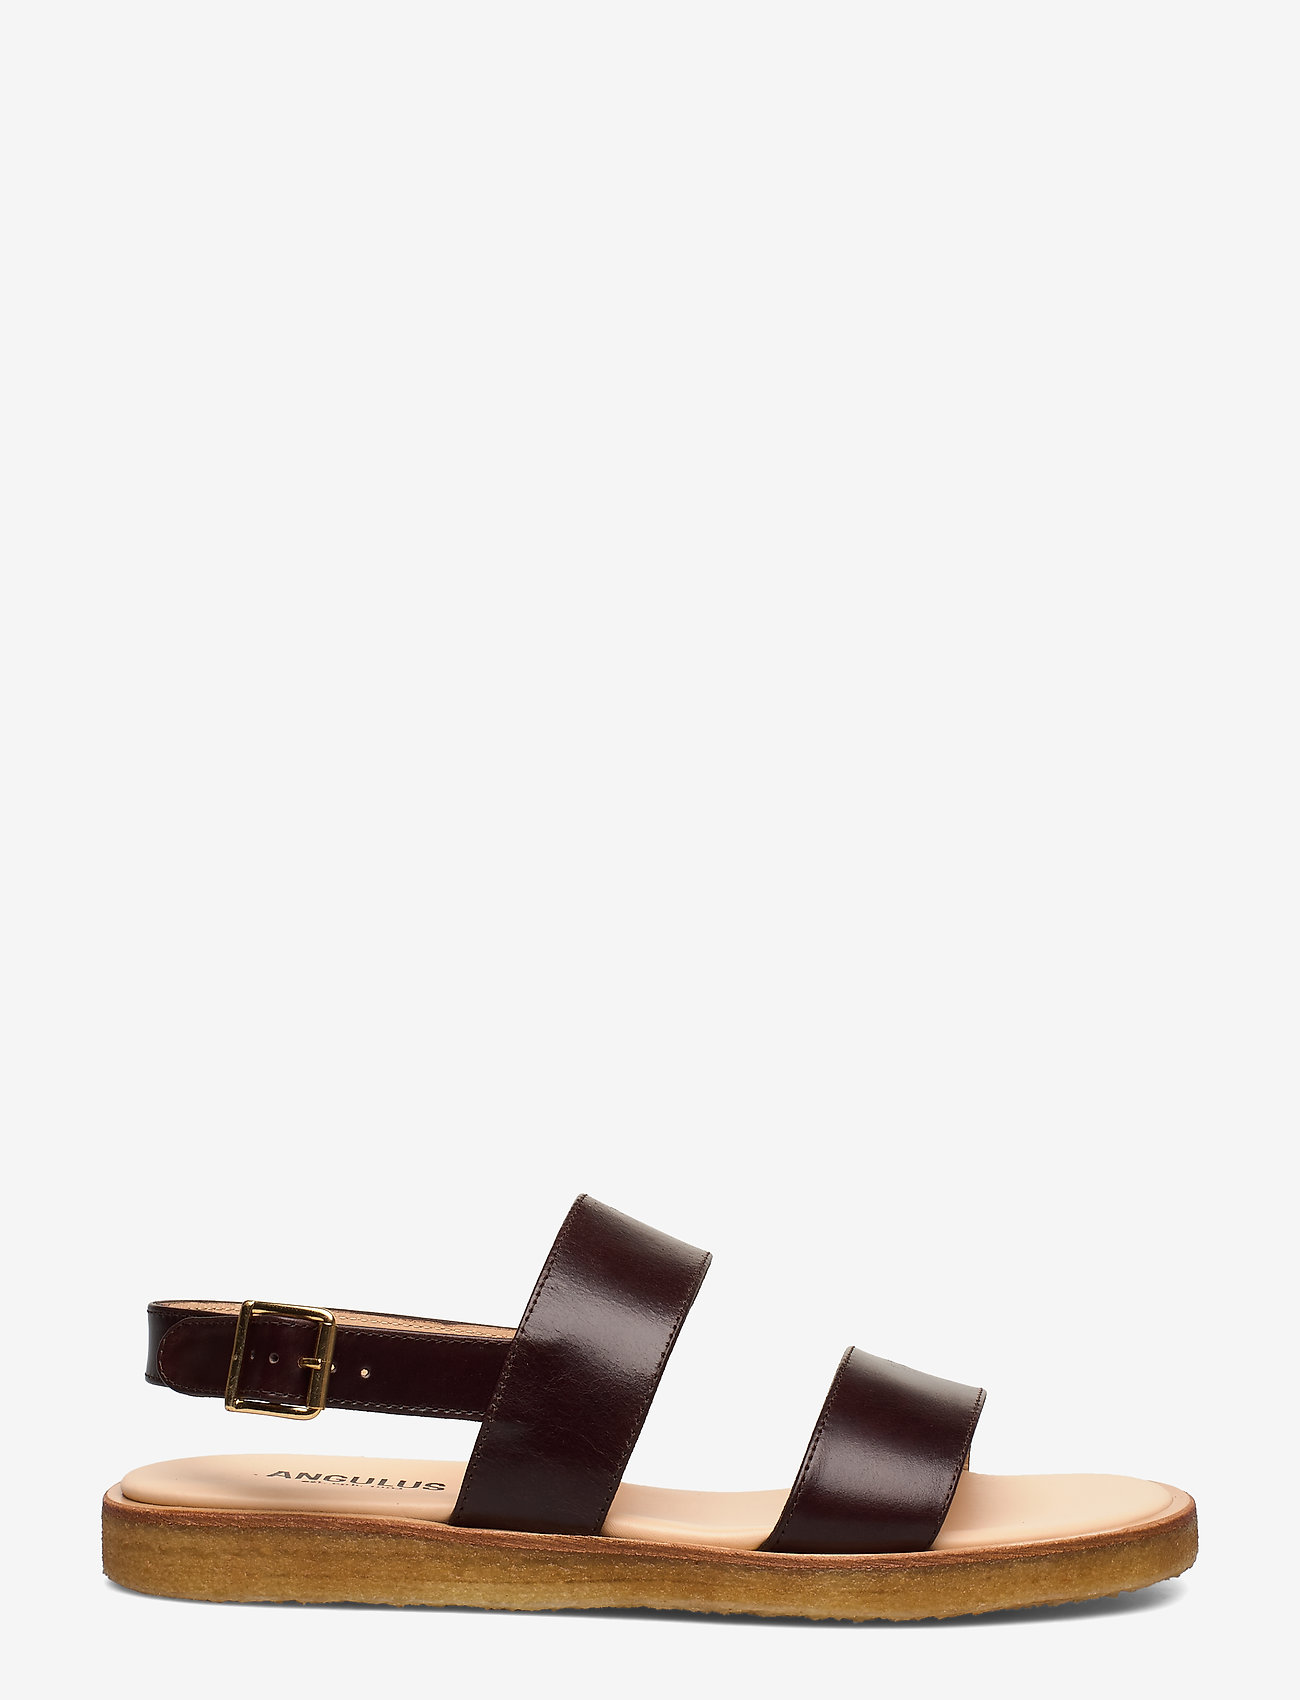 ANGULUS - 5452 - flate sandaler - 1836 dark brown - 1